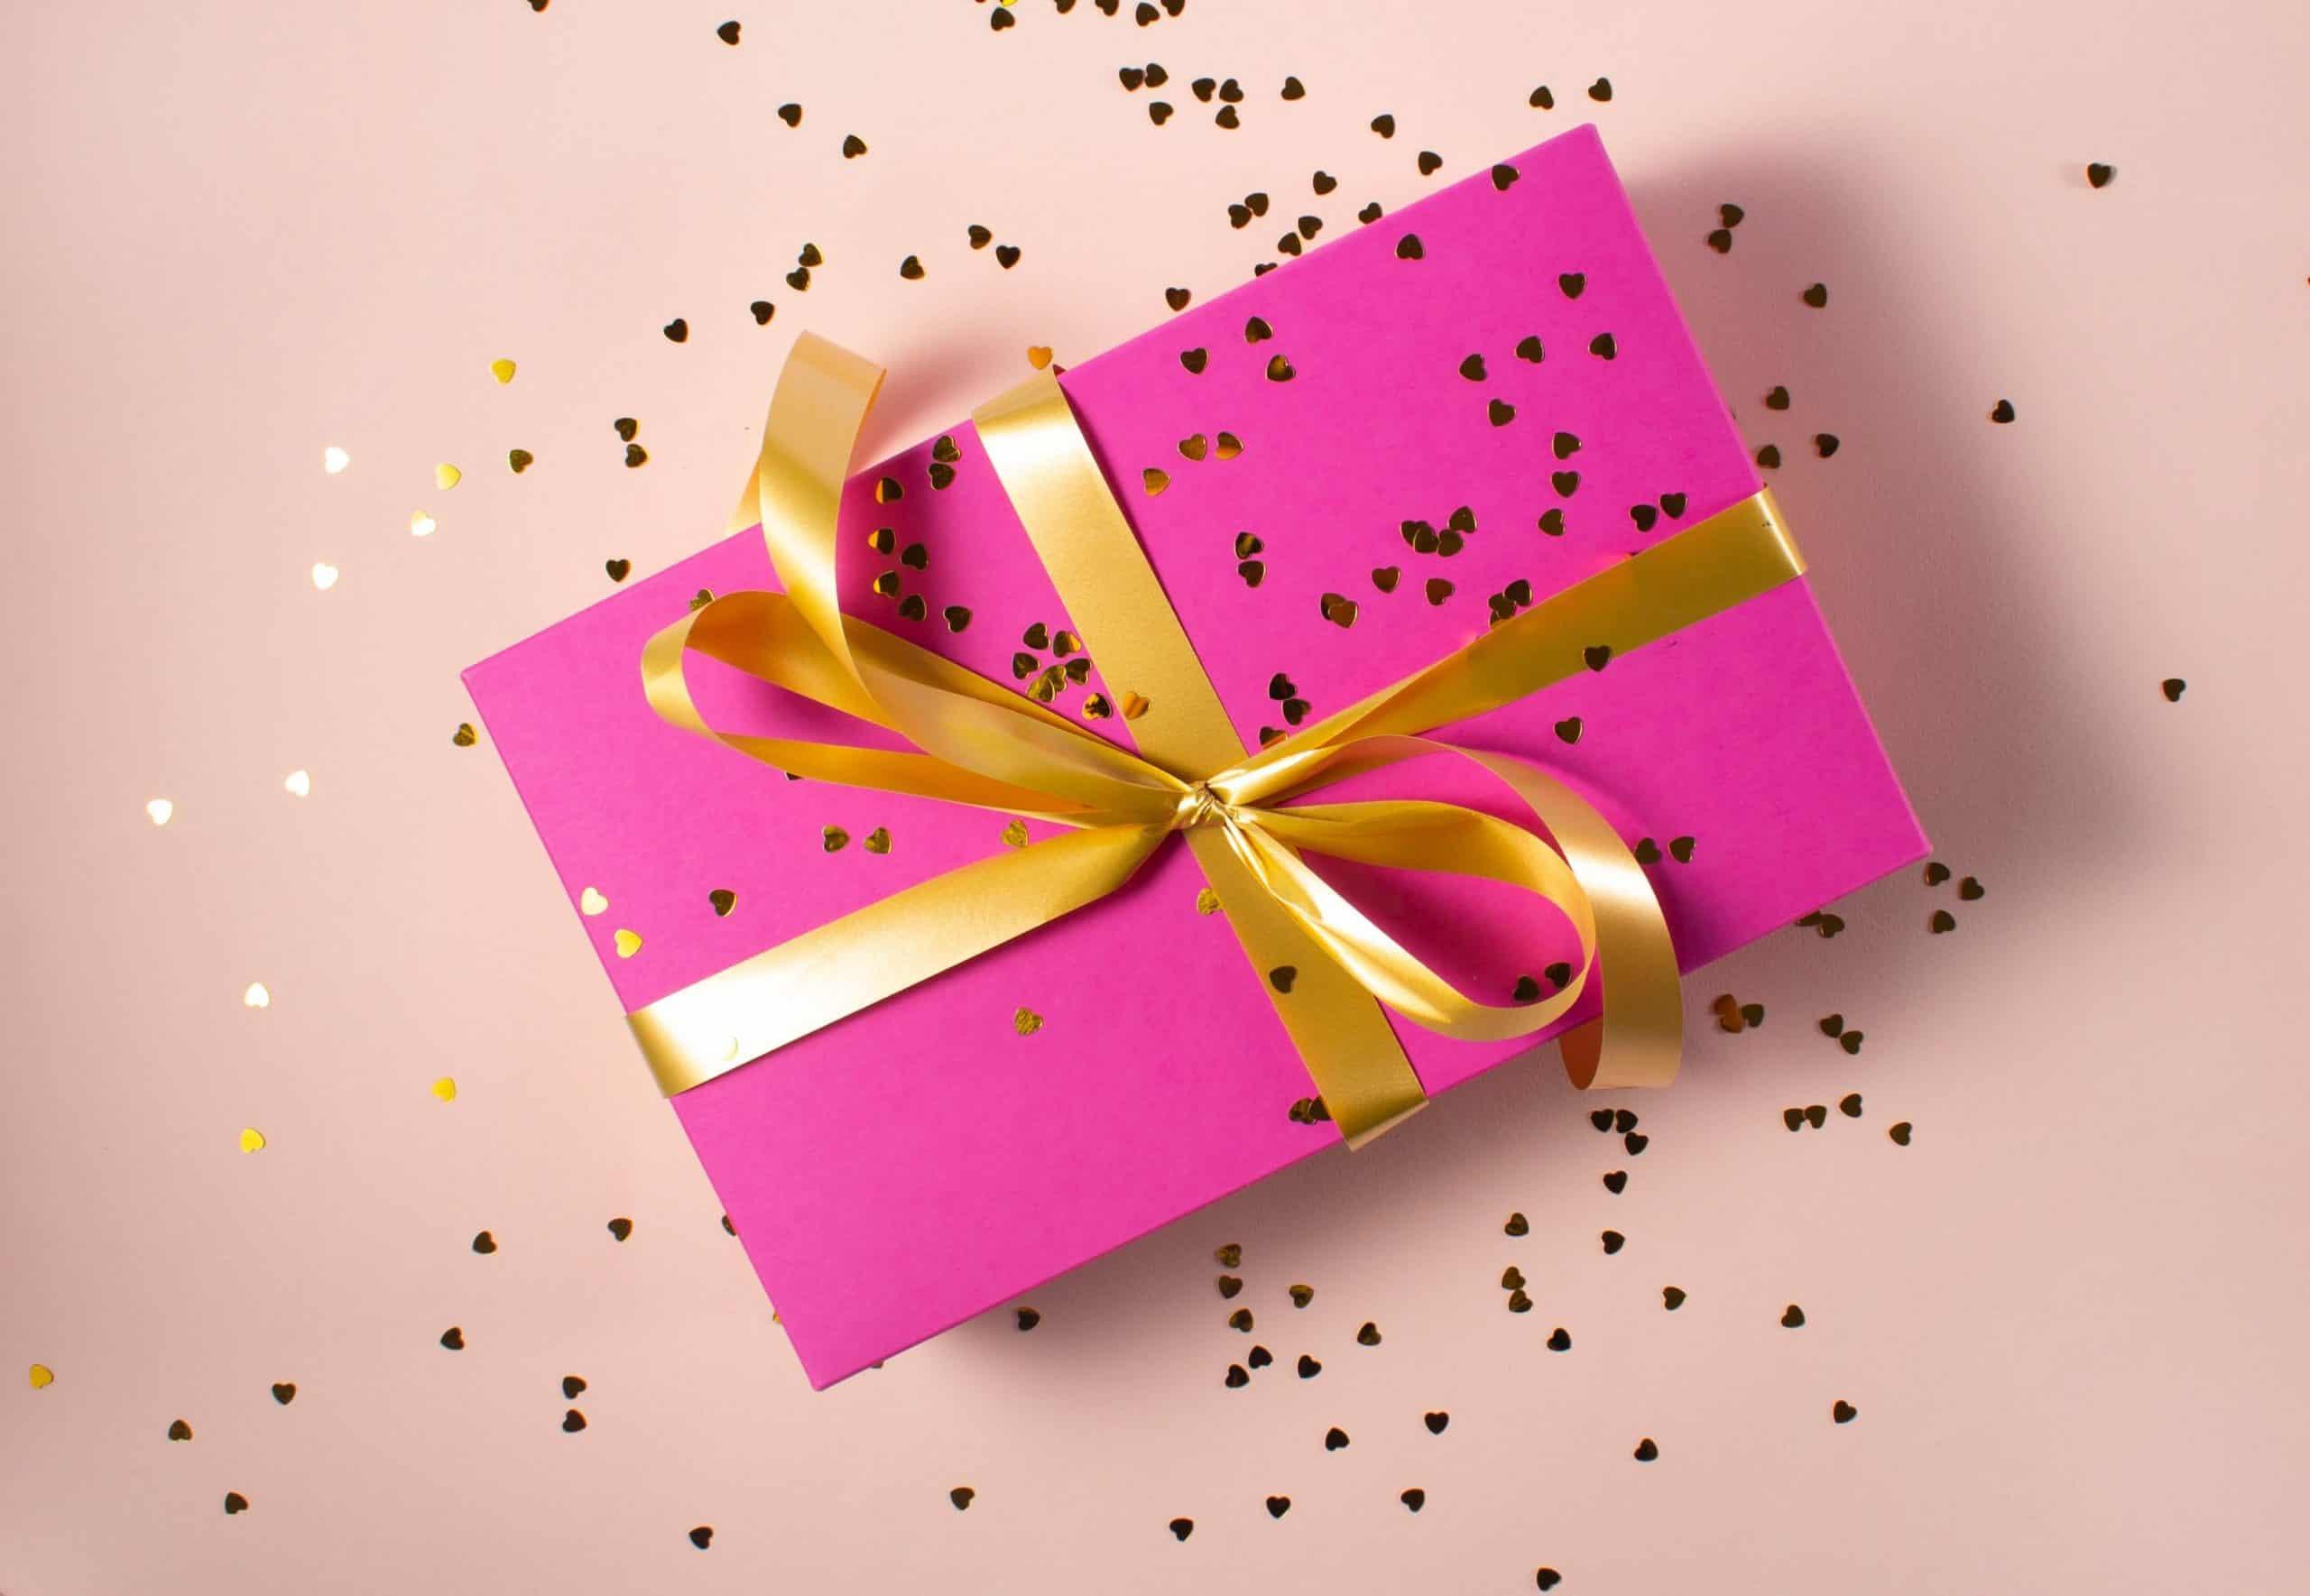 blogiversary gift ideas